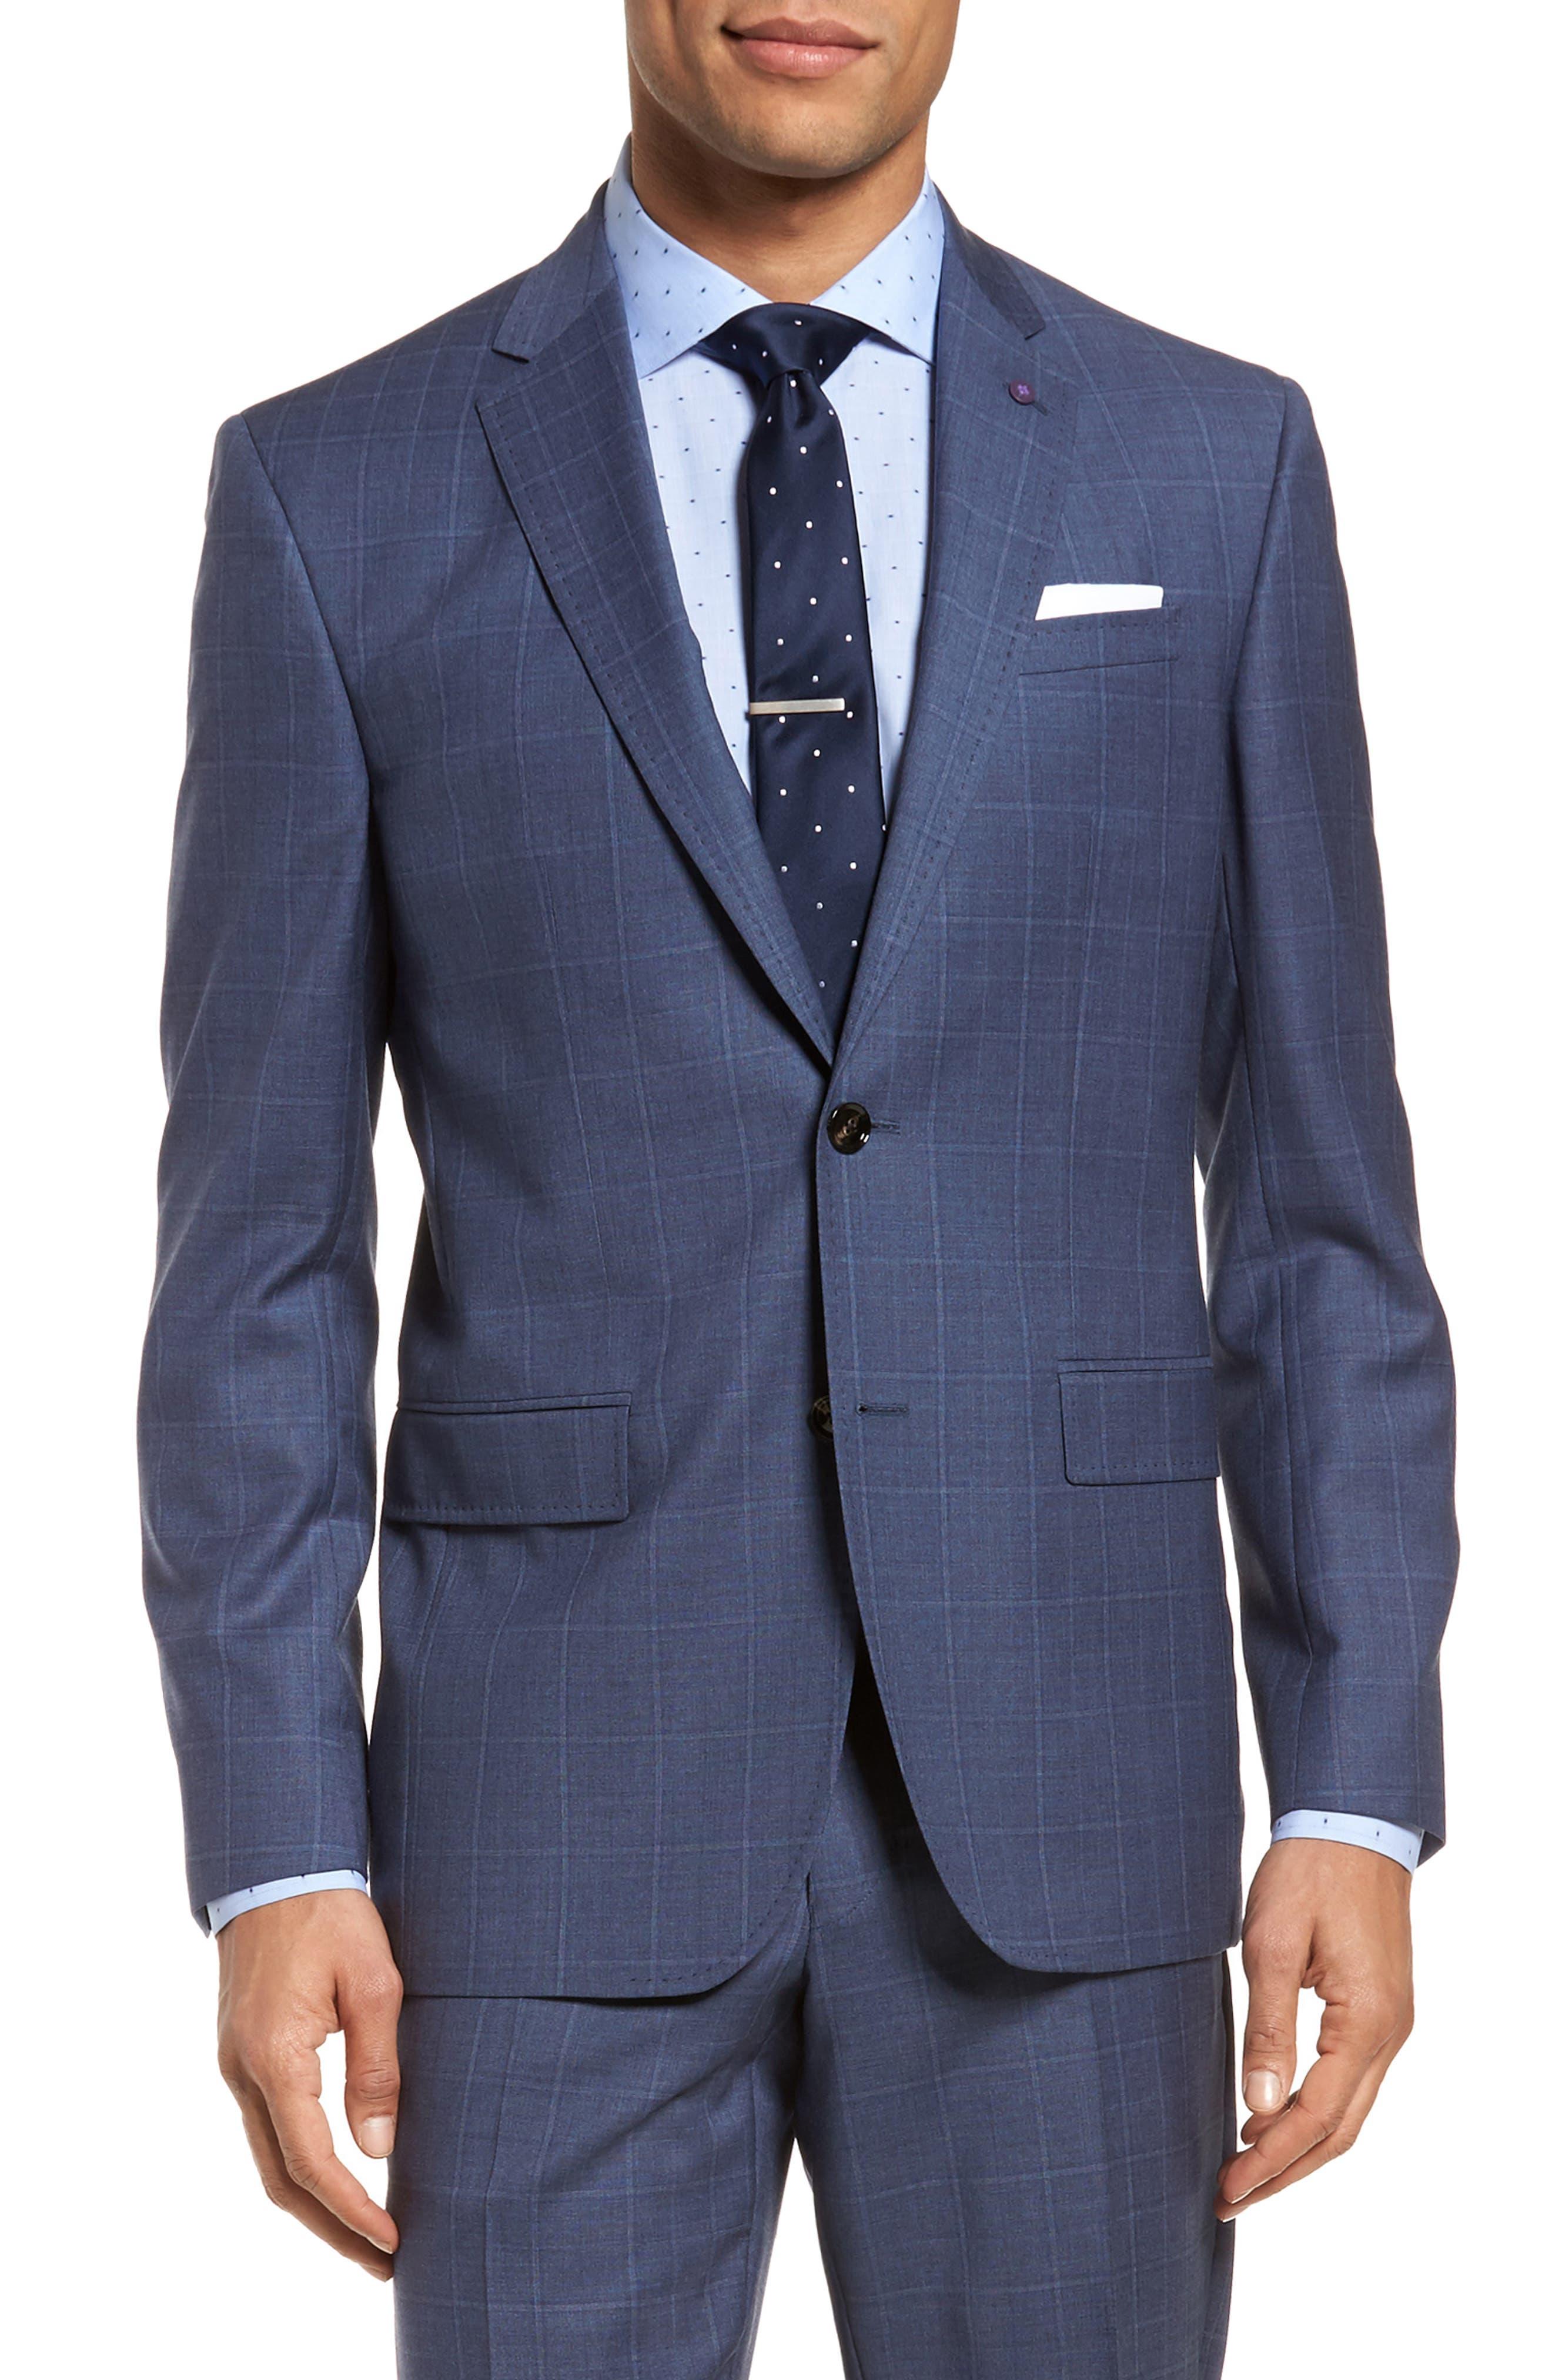 Jay Trim Fit Windowpane Wool Suit,                             Alternate thumbnail 5, color,                             420